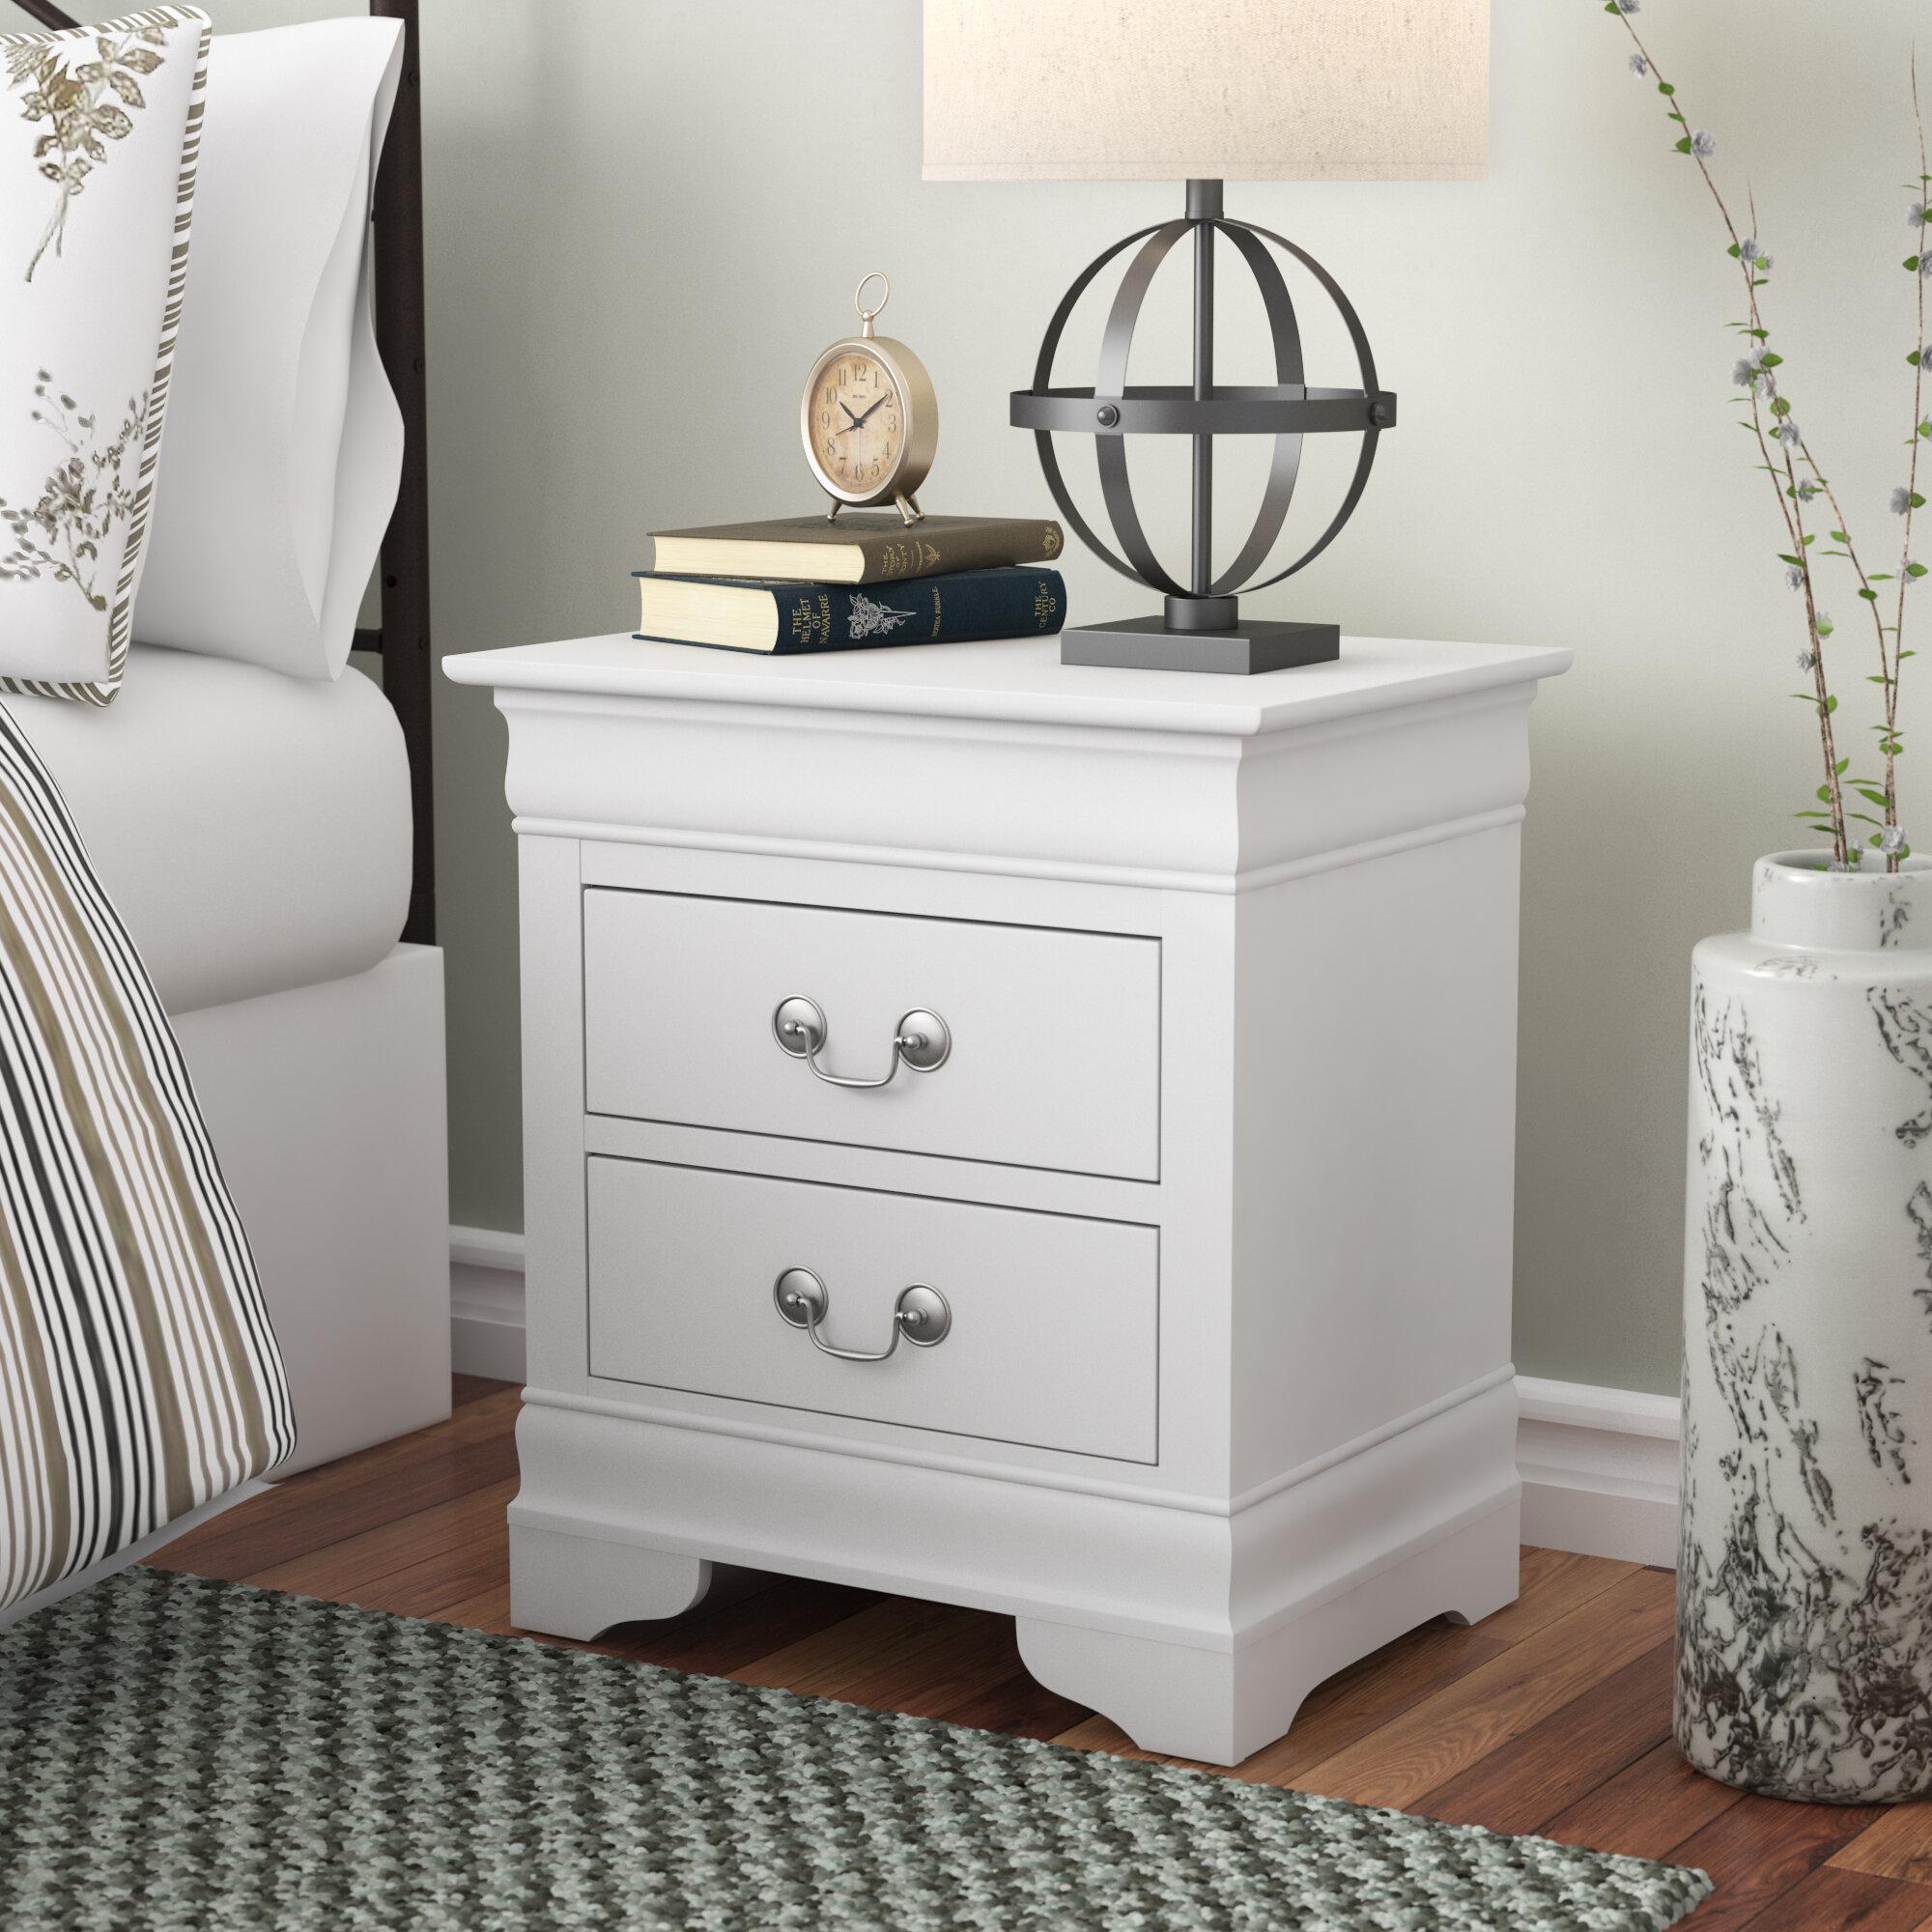 Lark manor lisle 2 drawer nightstand reviews wayfair